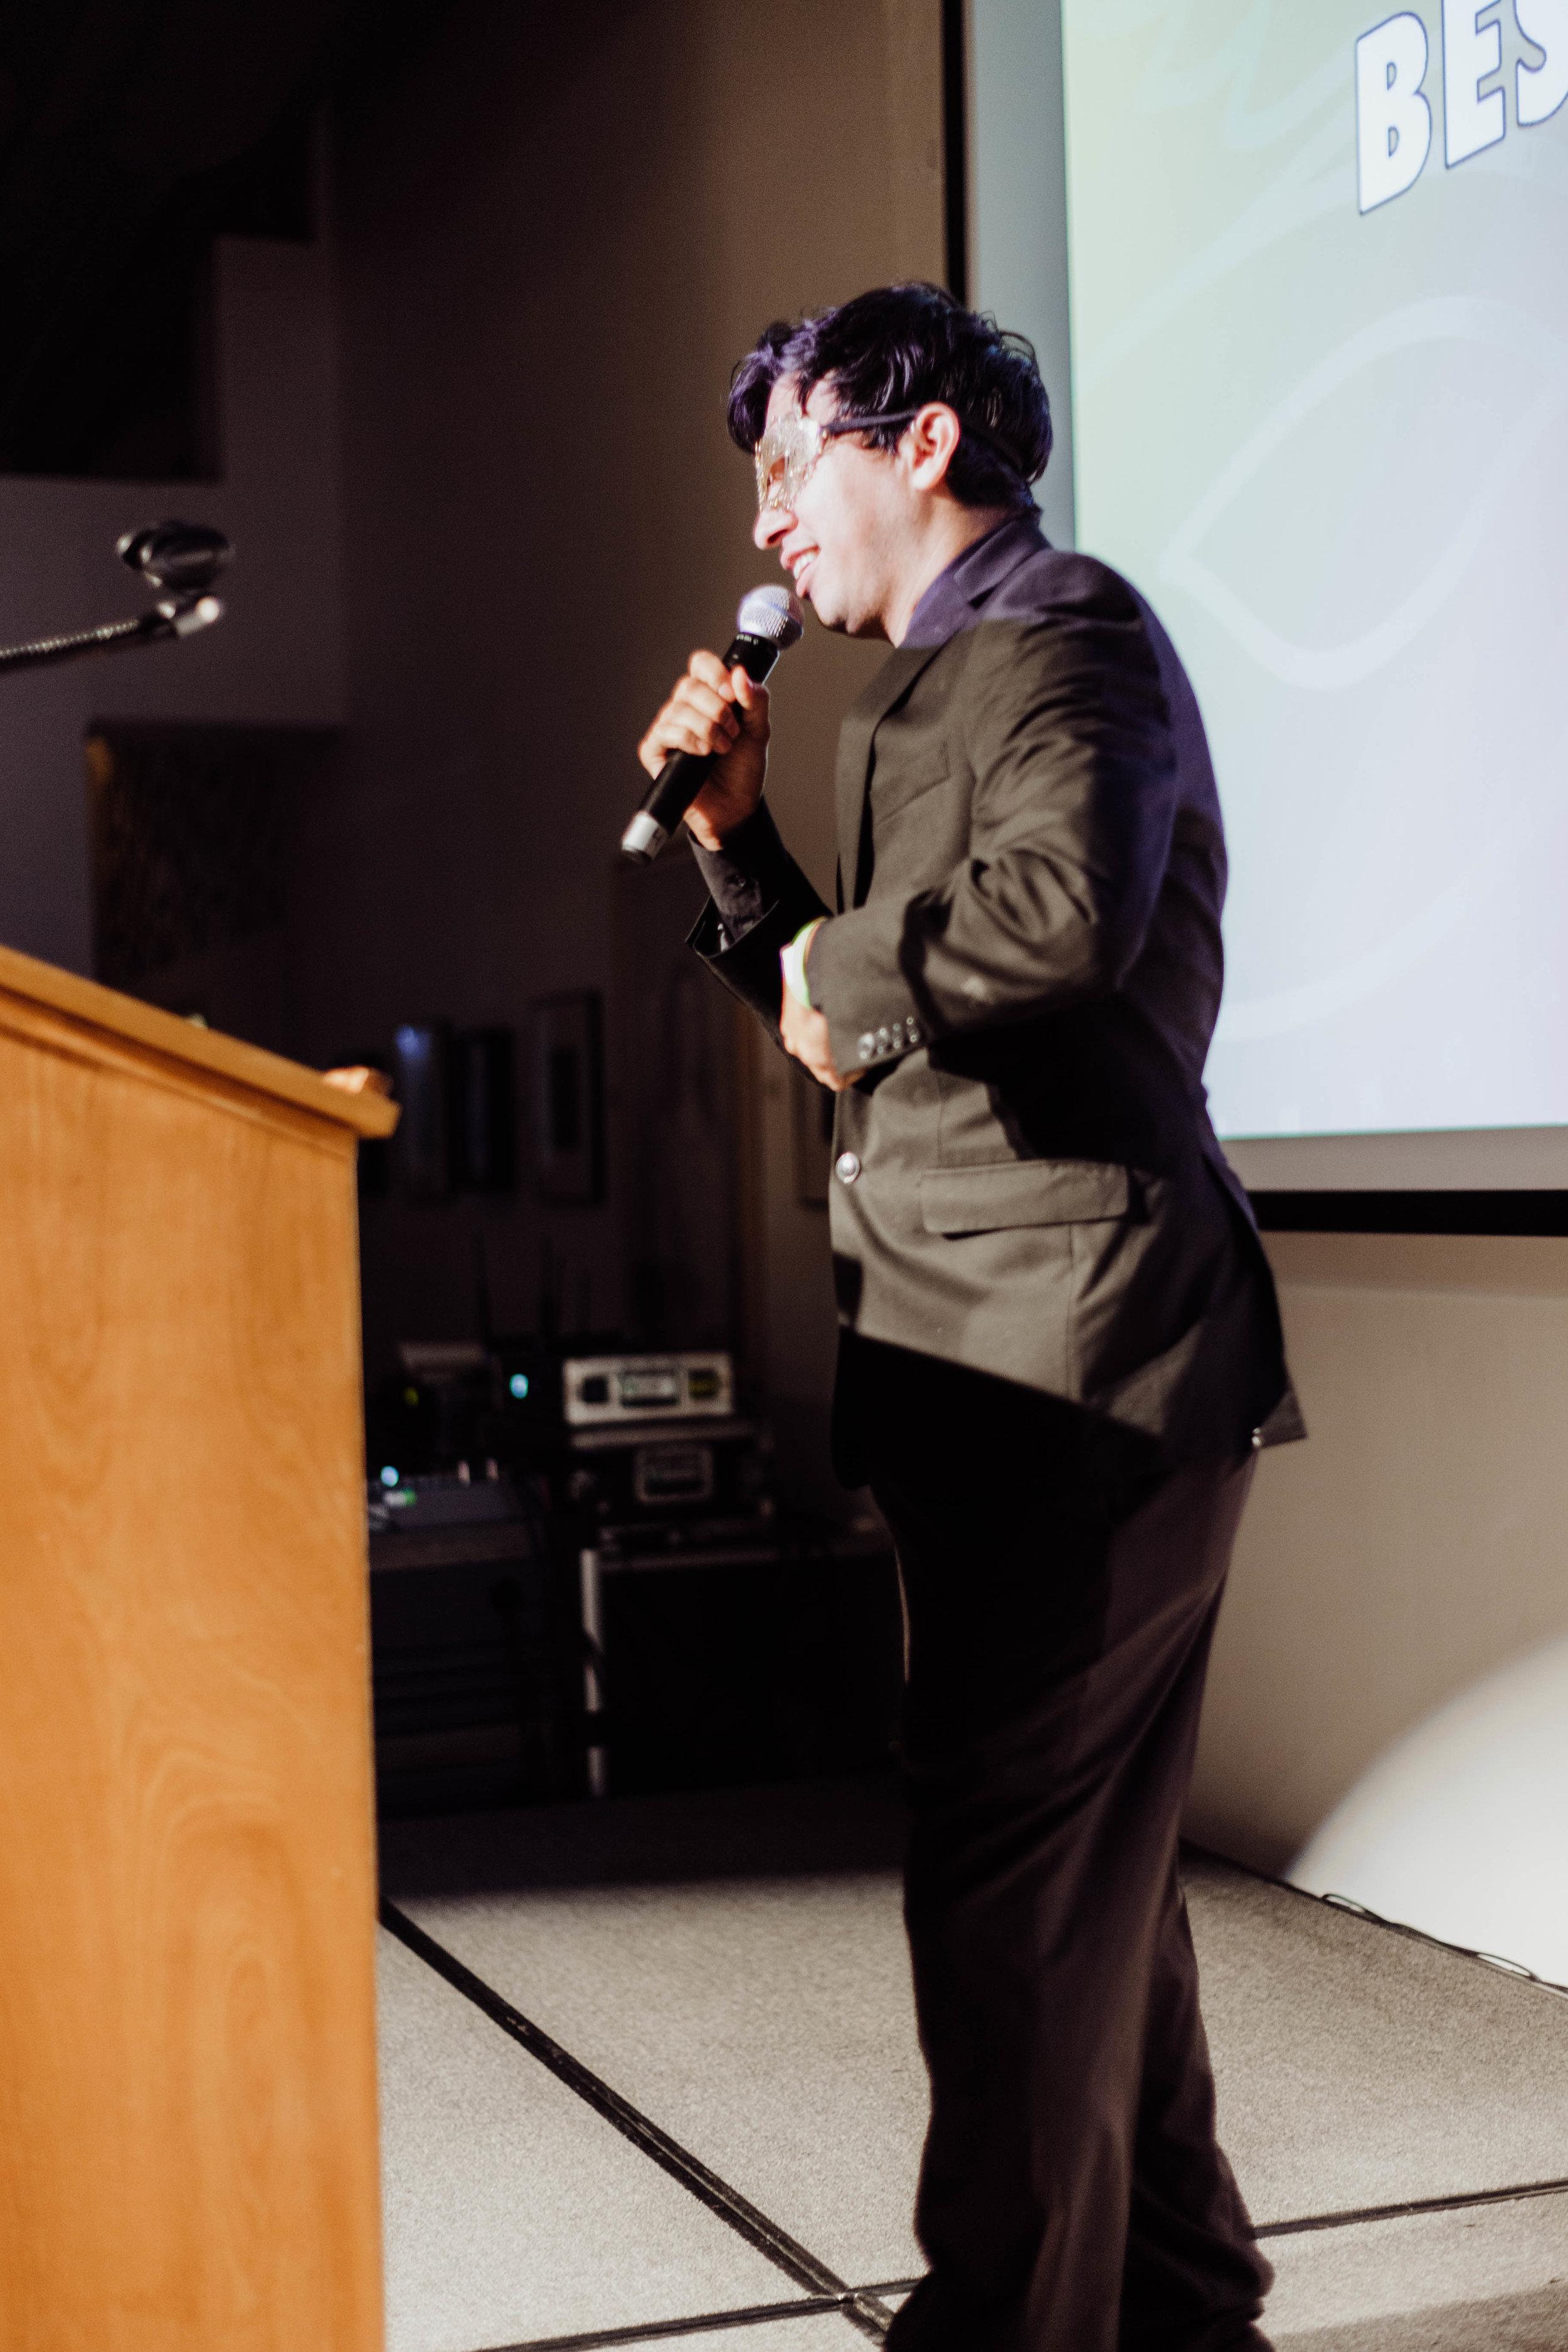 Mateo Granados presenting awards.